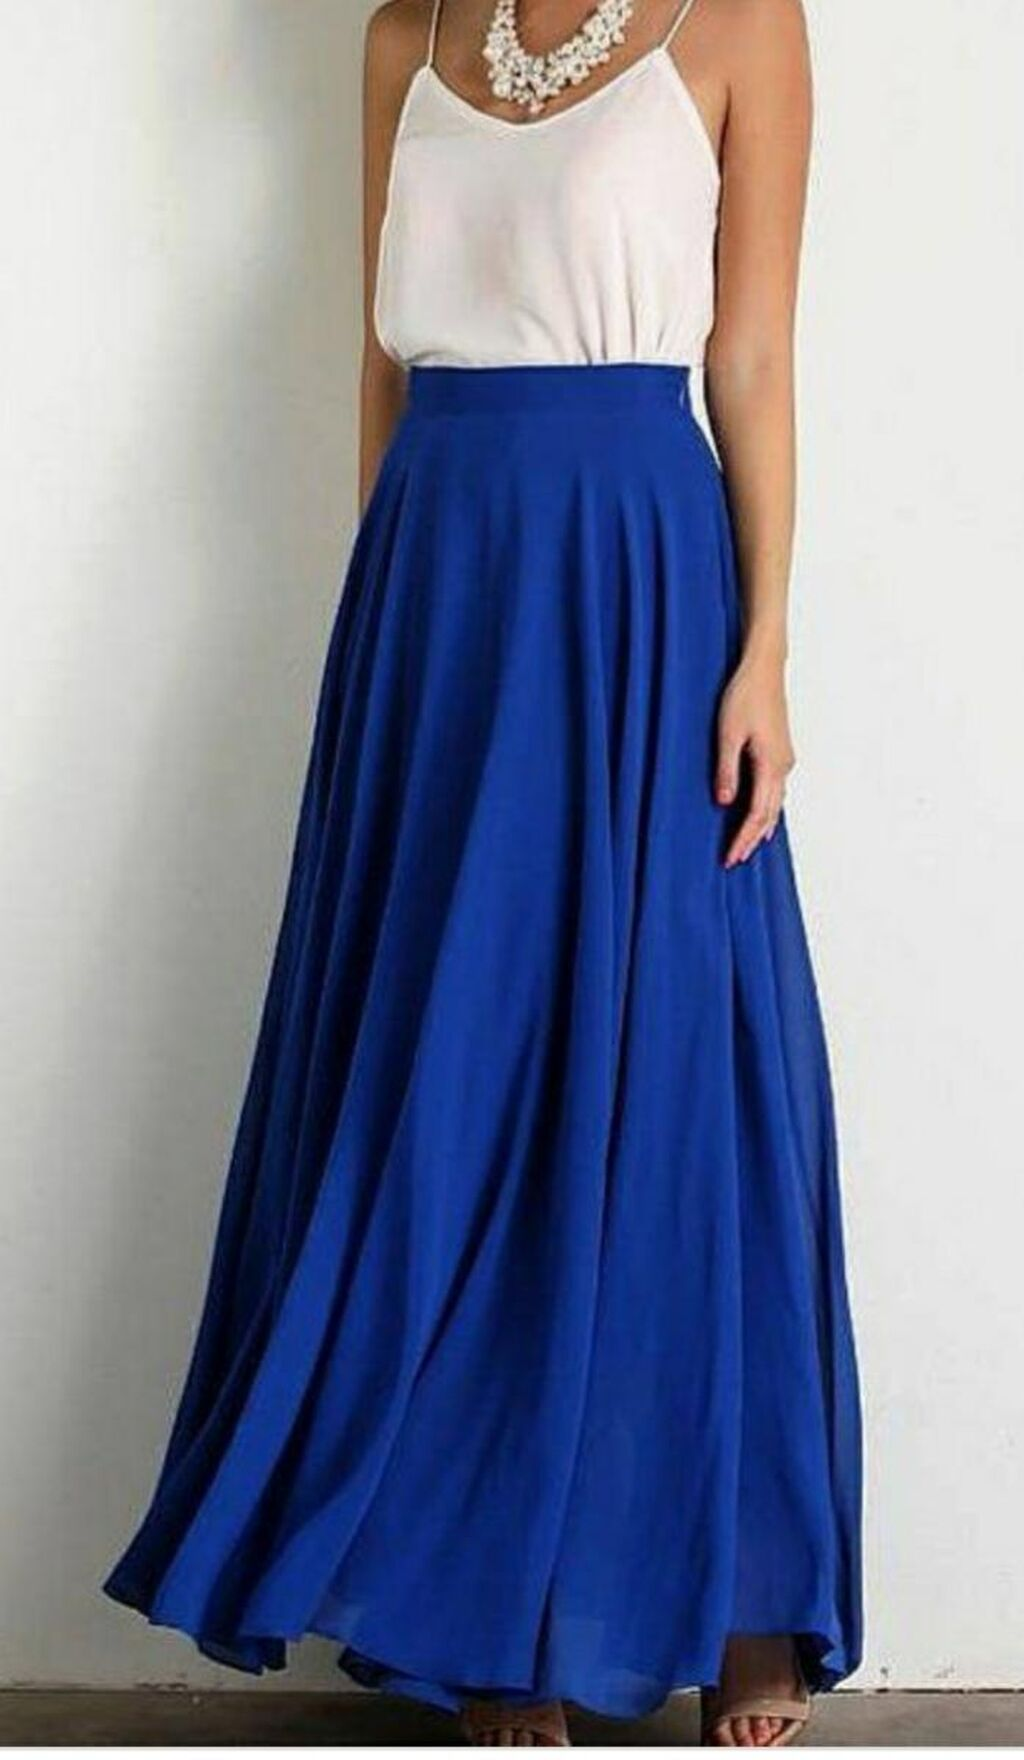 ZANZEA Royal plava suknja dugacka.   Veličina 36  BEZ RAZMENE